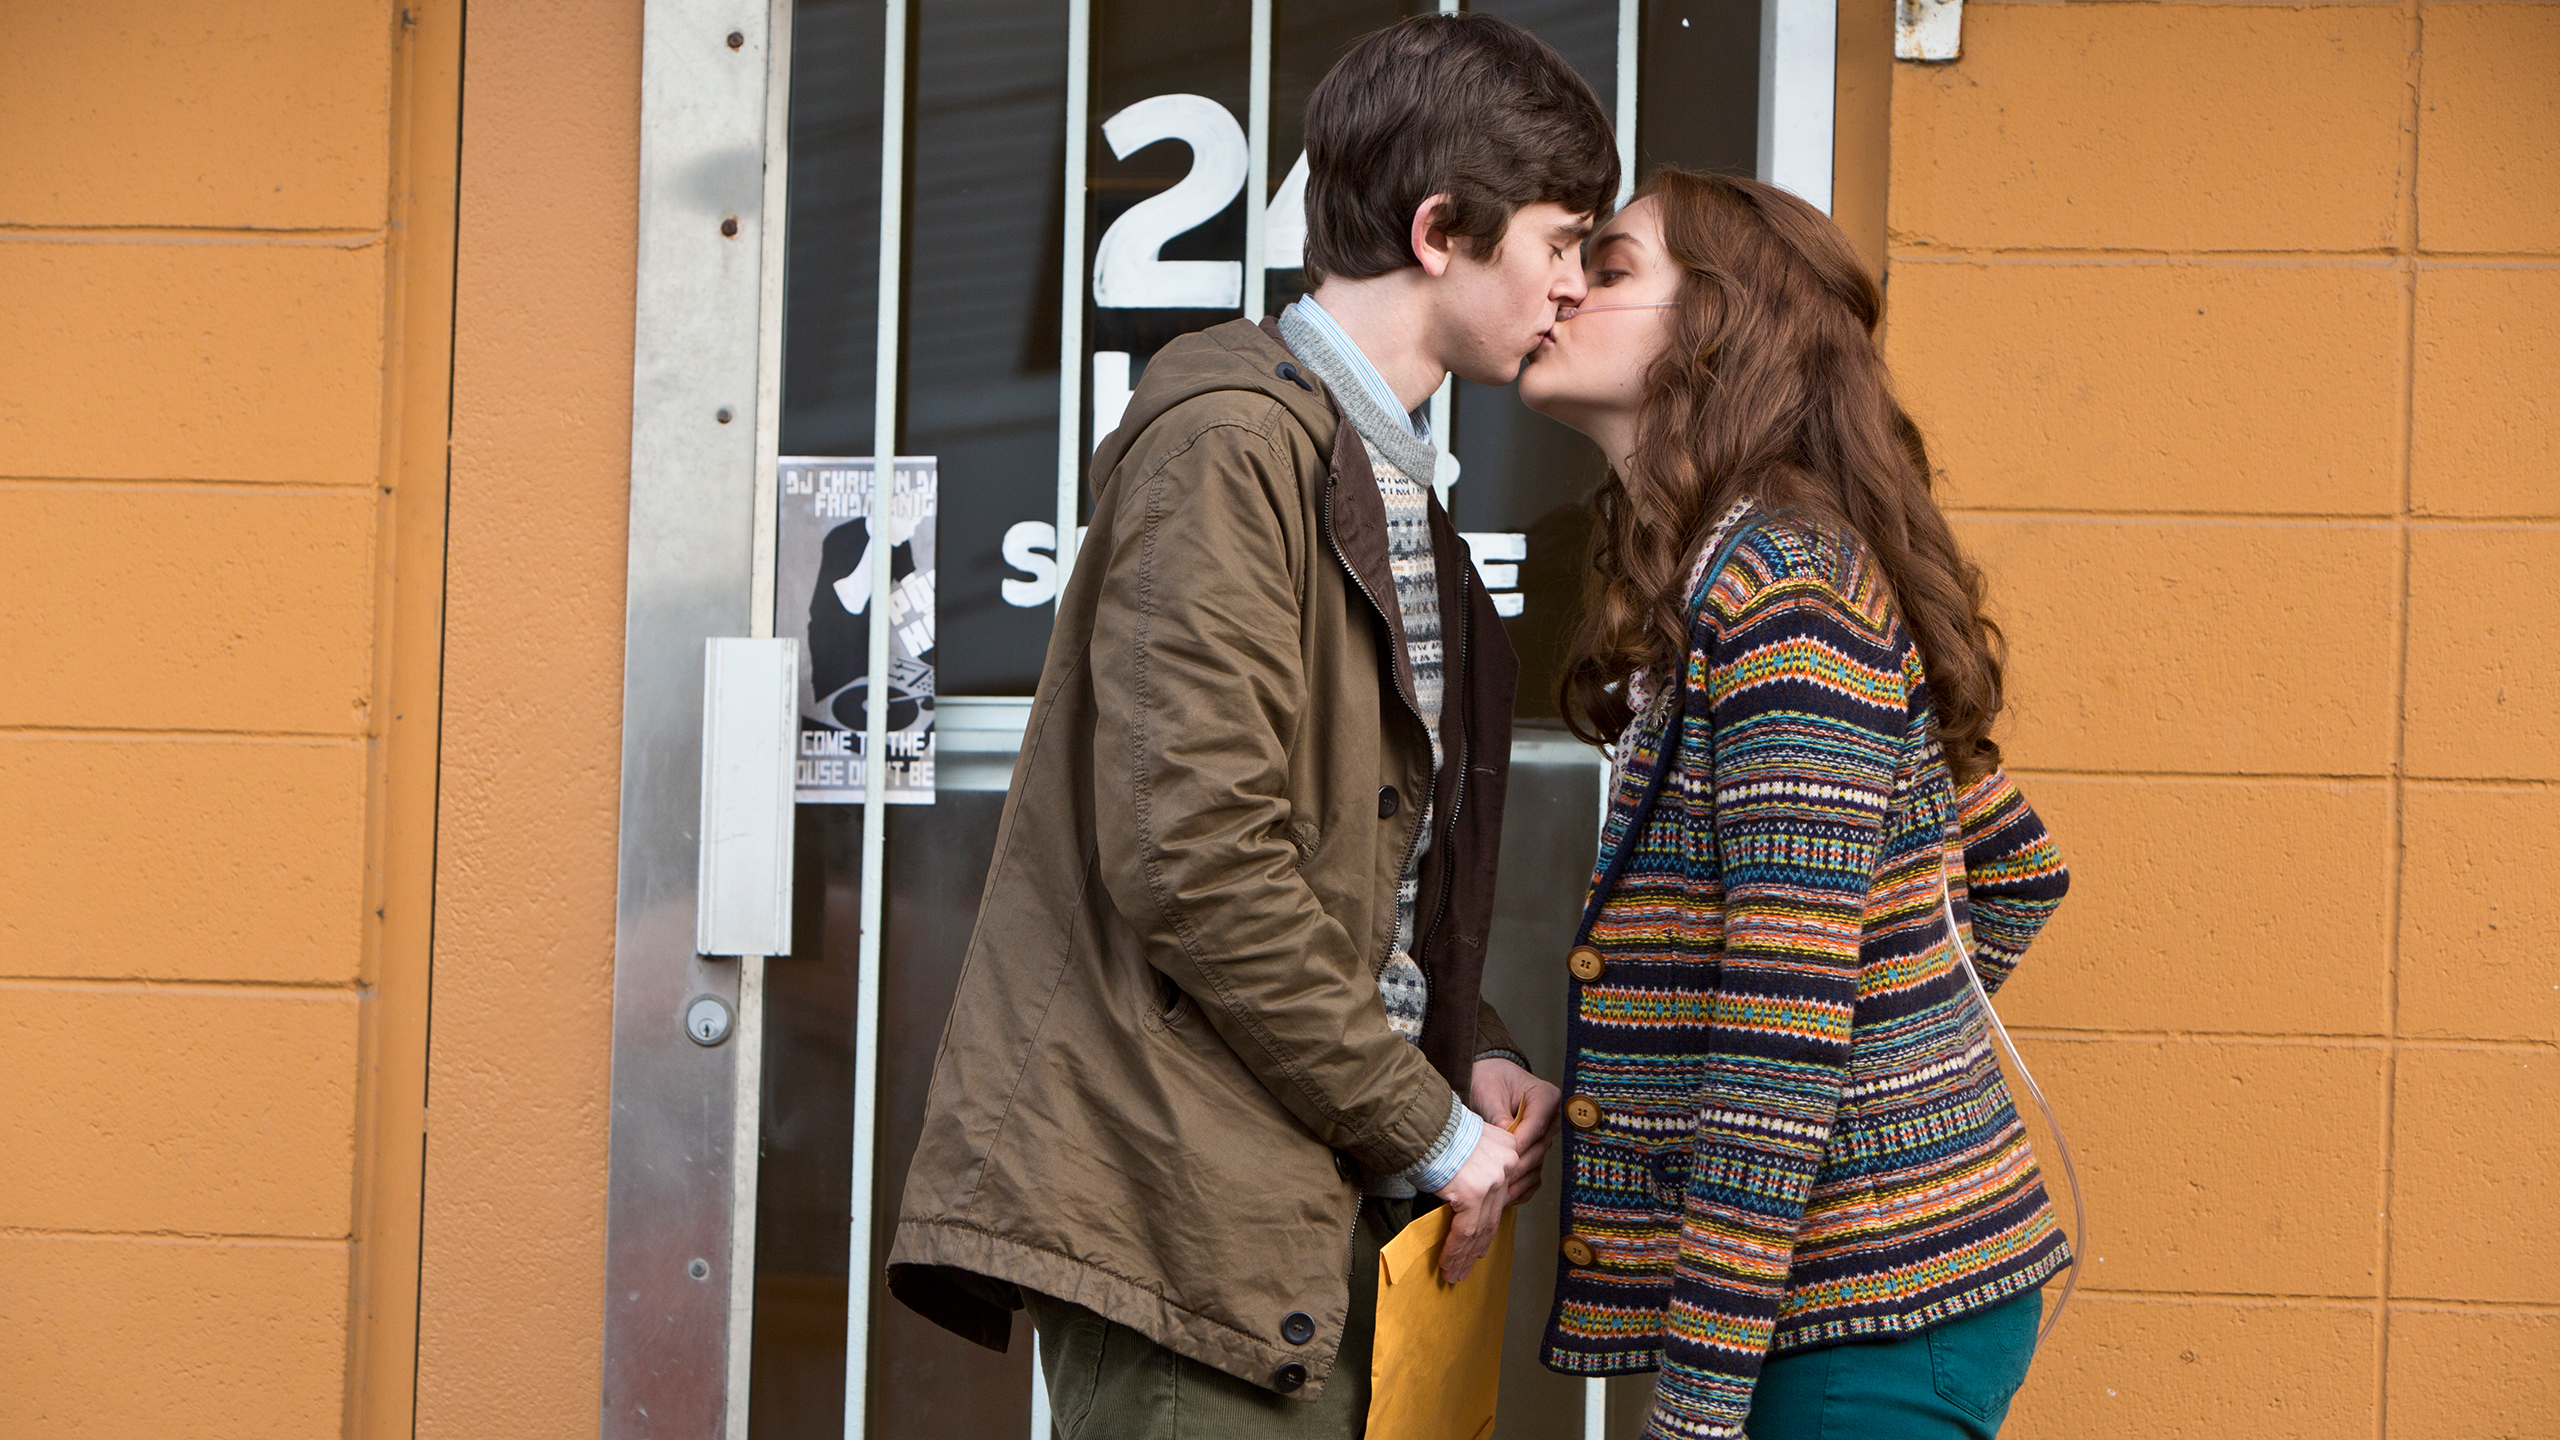 File:05-emma-gives-norman-an-awkward-kiss.jpg